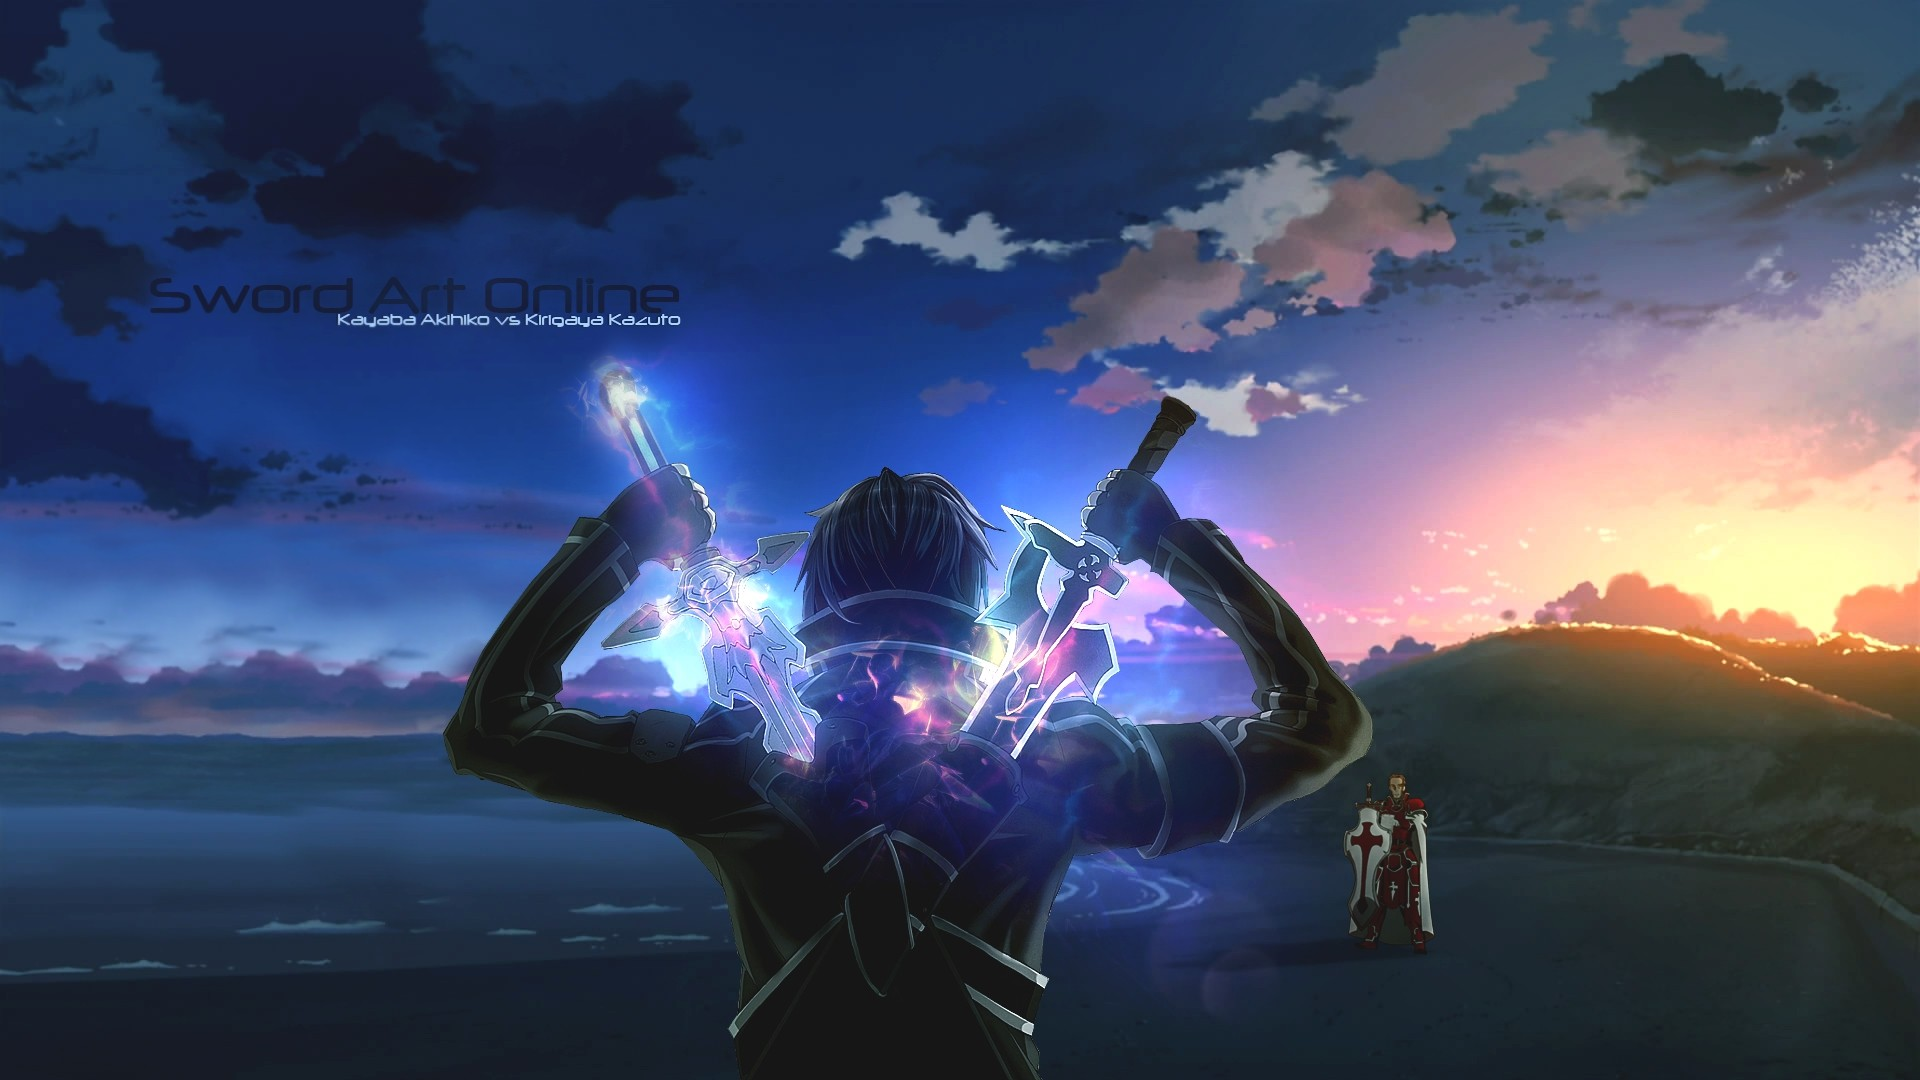 Kayaba Akihiko Kirito Sword Art Online Sunrise Sword Sword Art Online Weapon 1920x1080